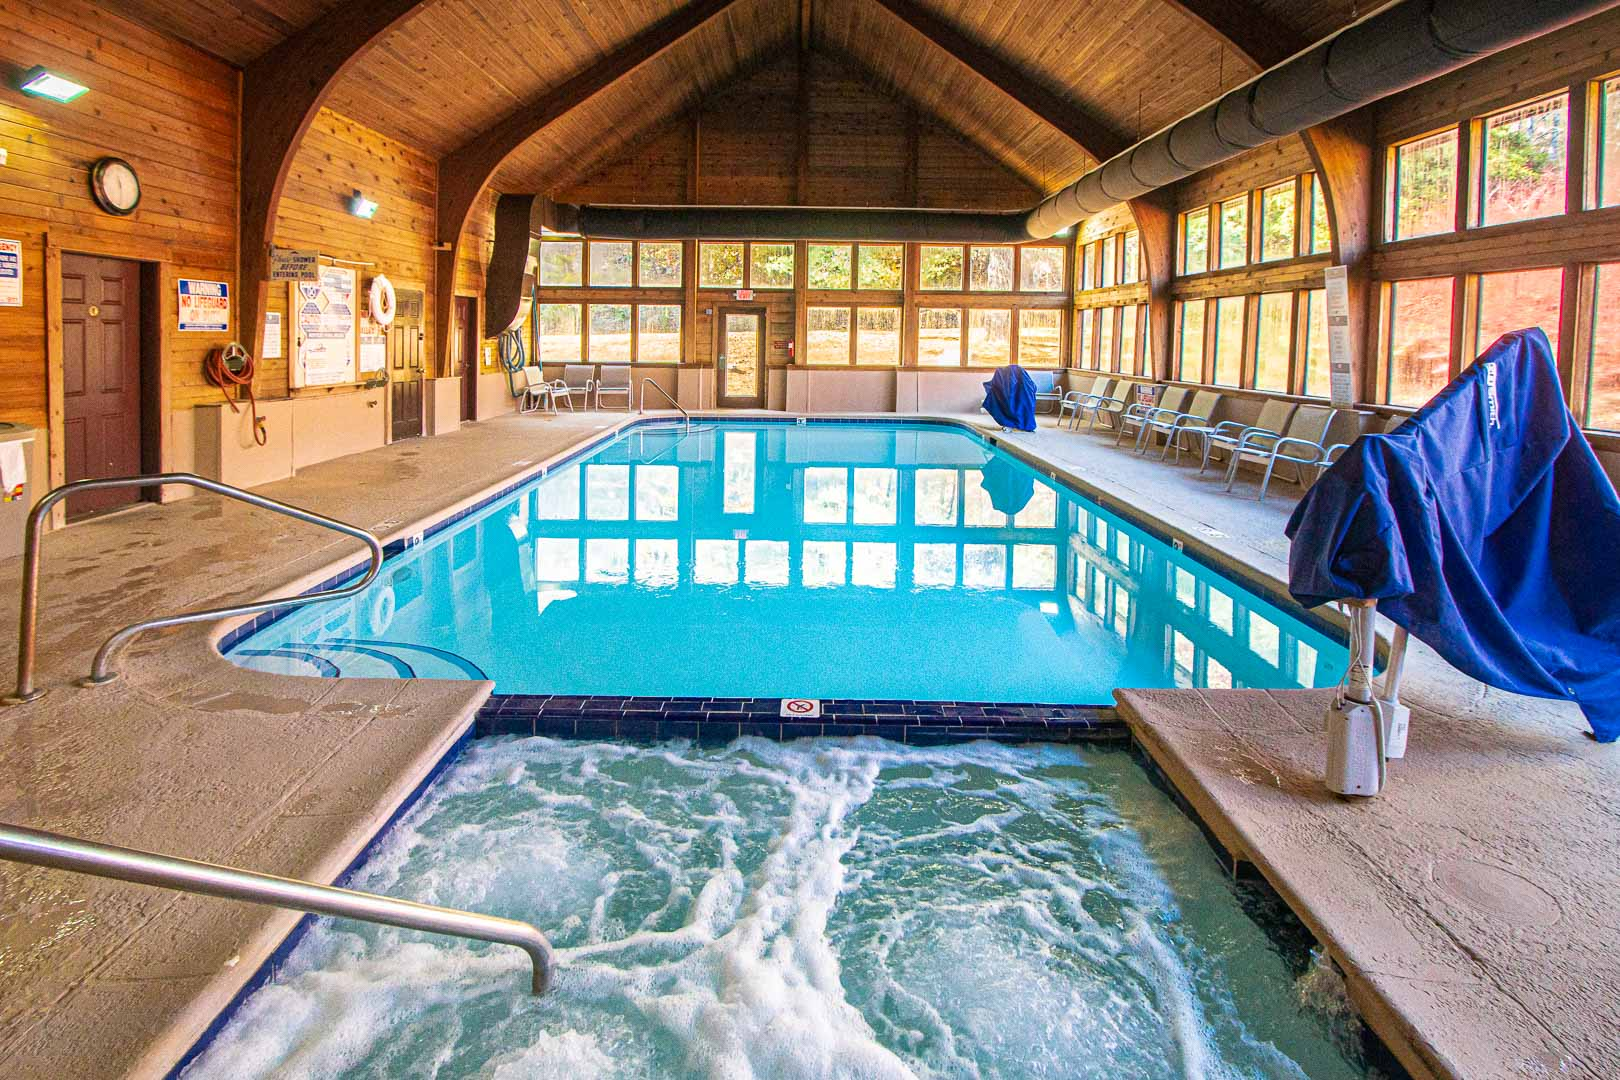 A spacious indoor swimming pool at VRI's Mountain Loft Resort in North Carolina.